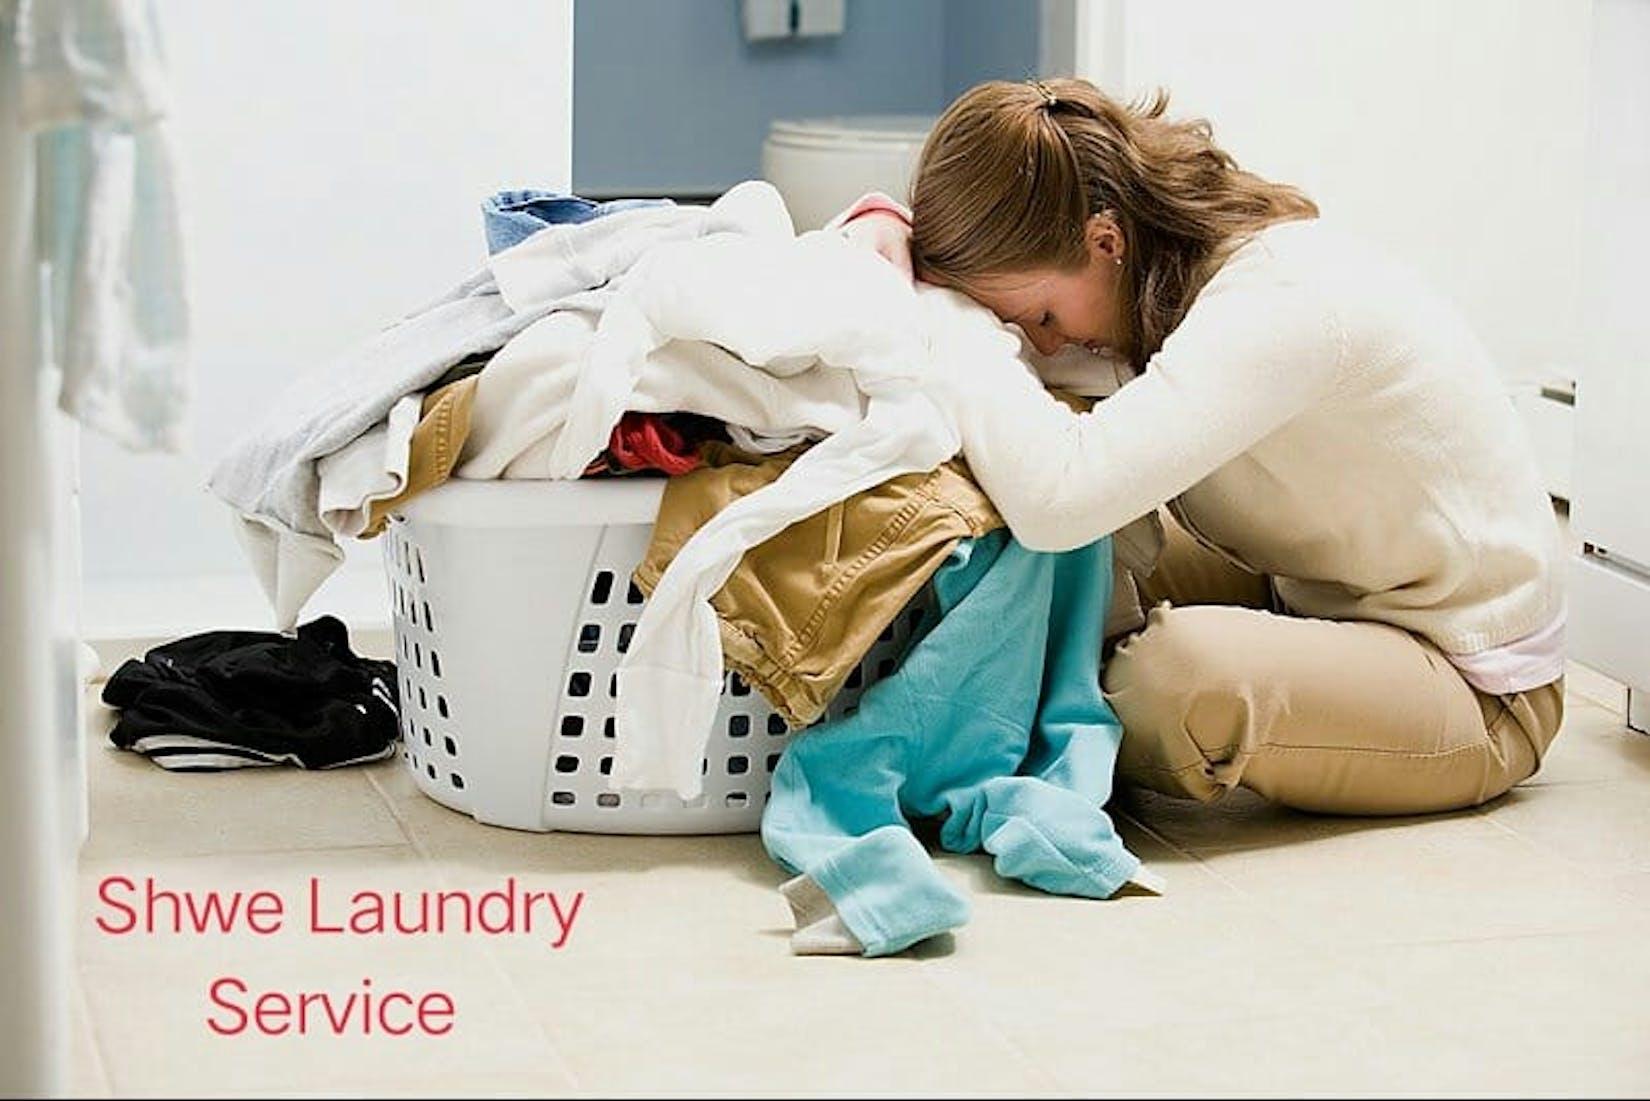 Shwe Laundry Service | Beauty